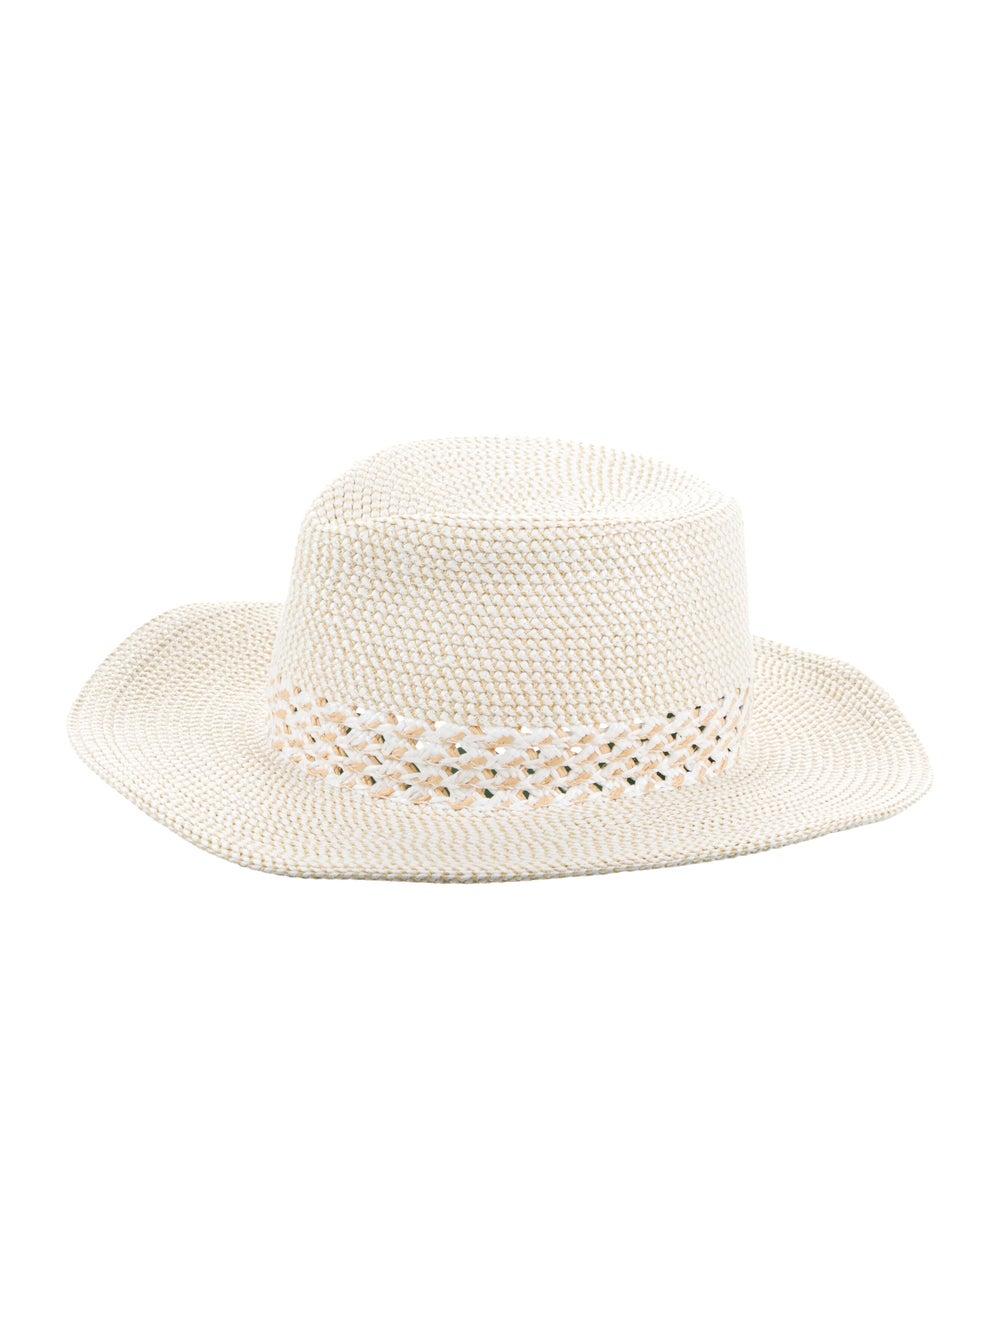 Eric Javits Woven Straw Hat white - image 1